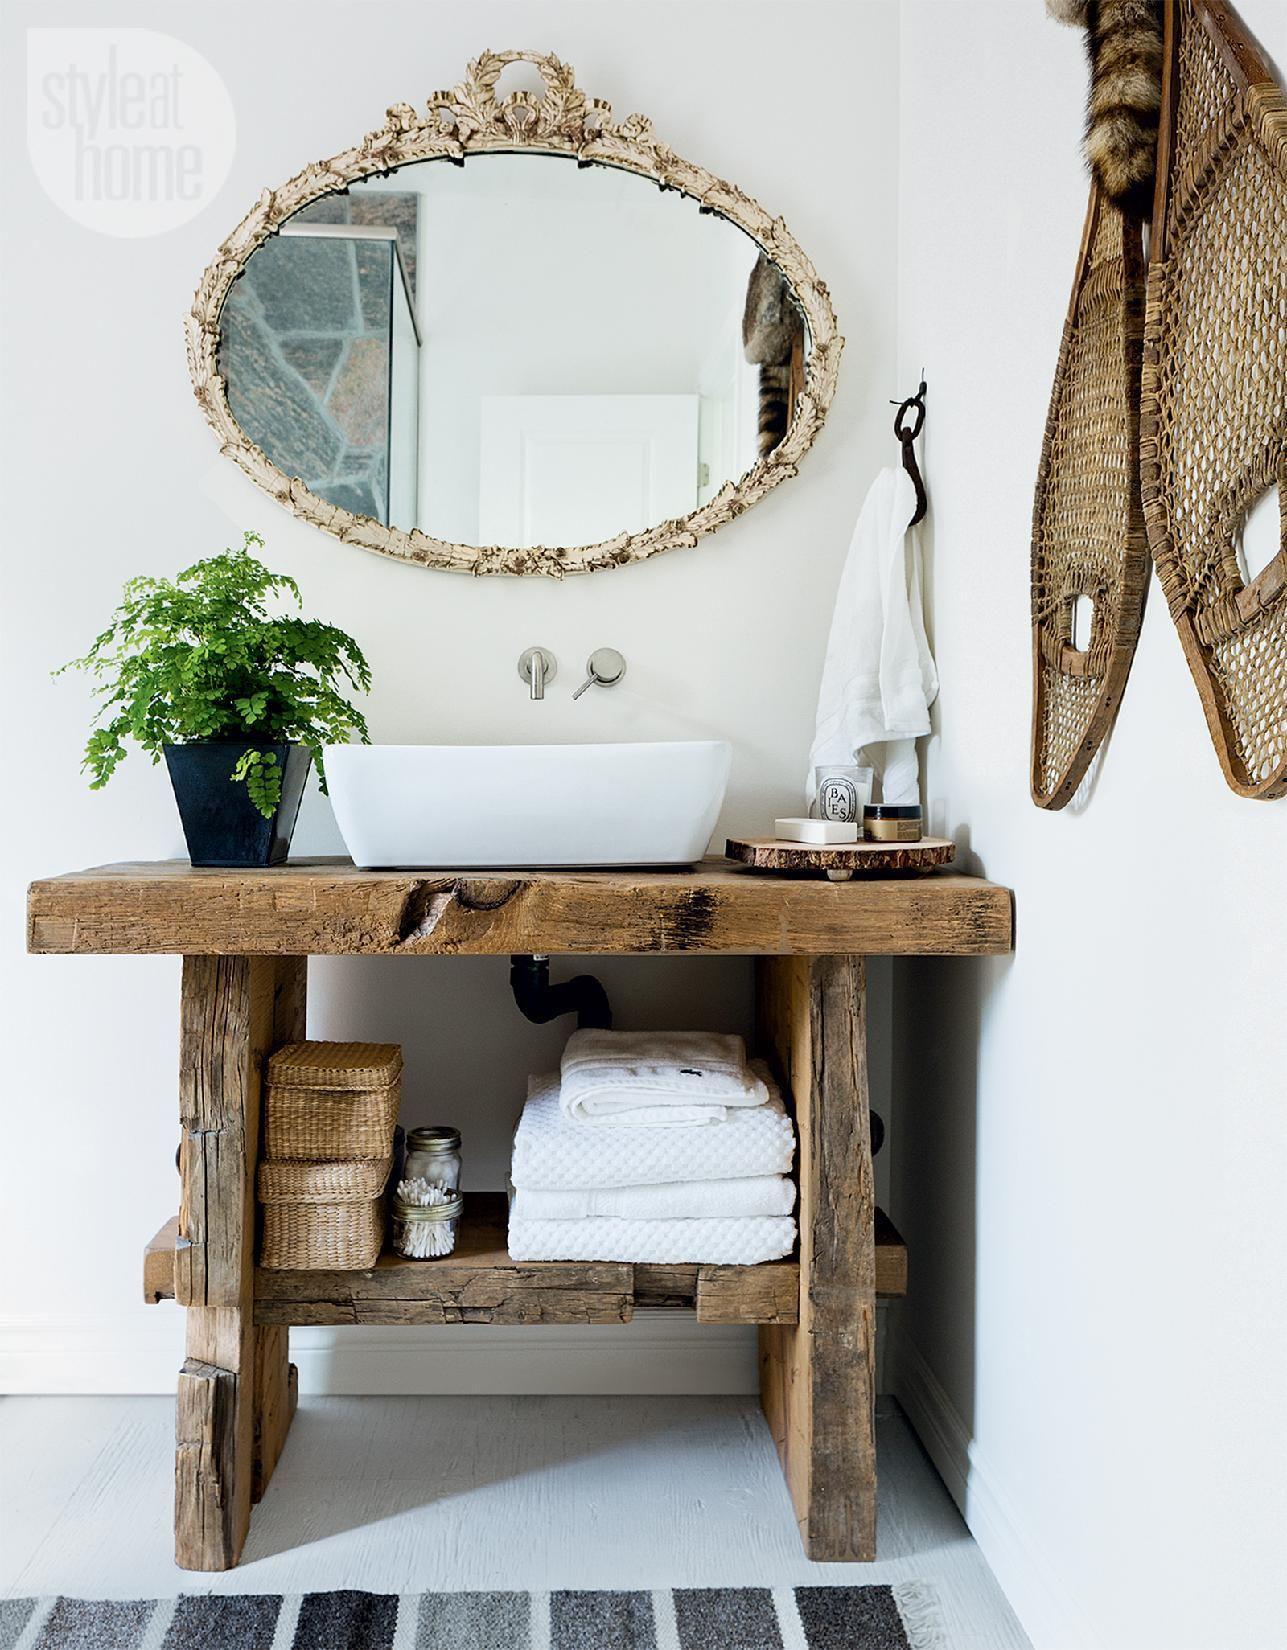 CC71.jpg 1,287×1,650 pixels | Bathroom | Pinterest | Bath, House and ...